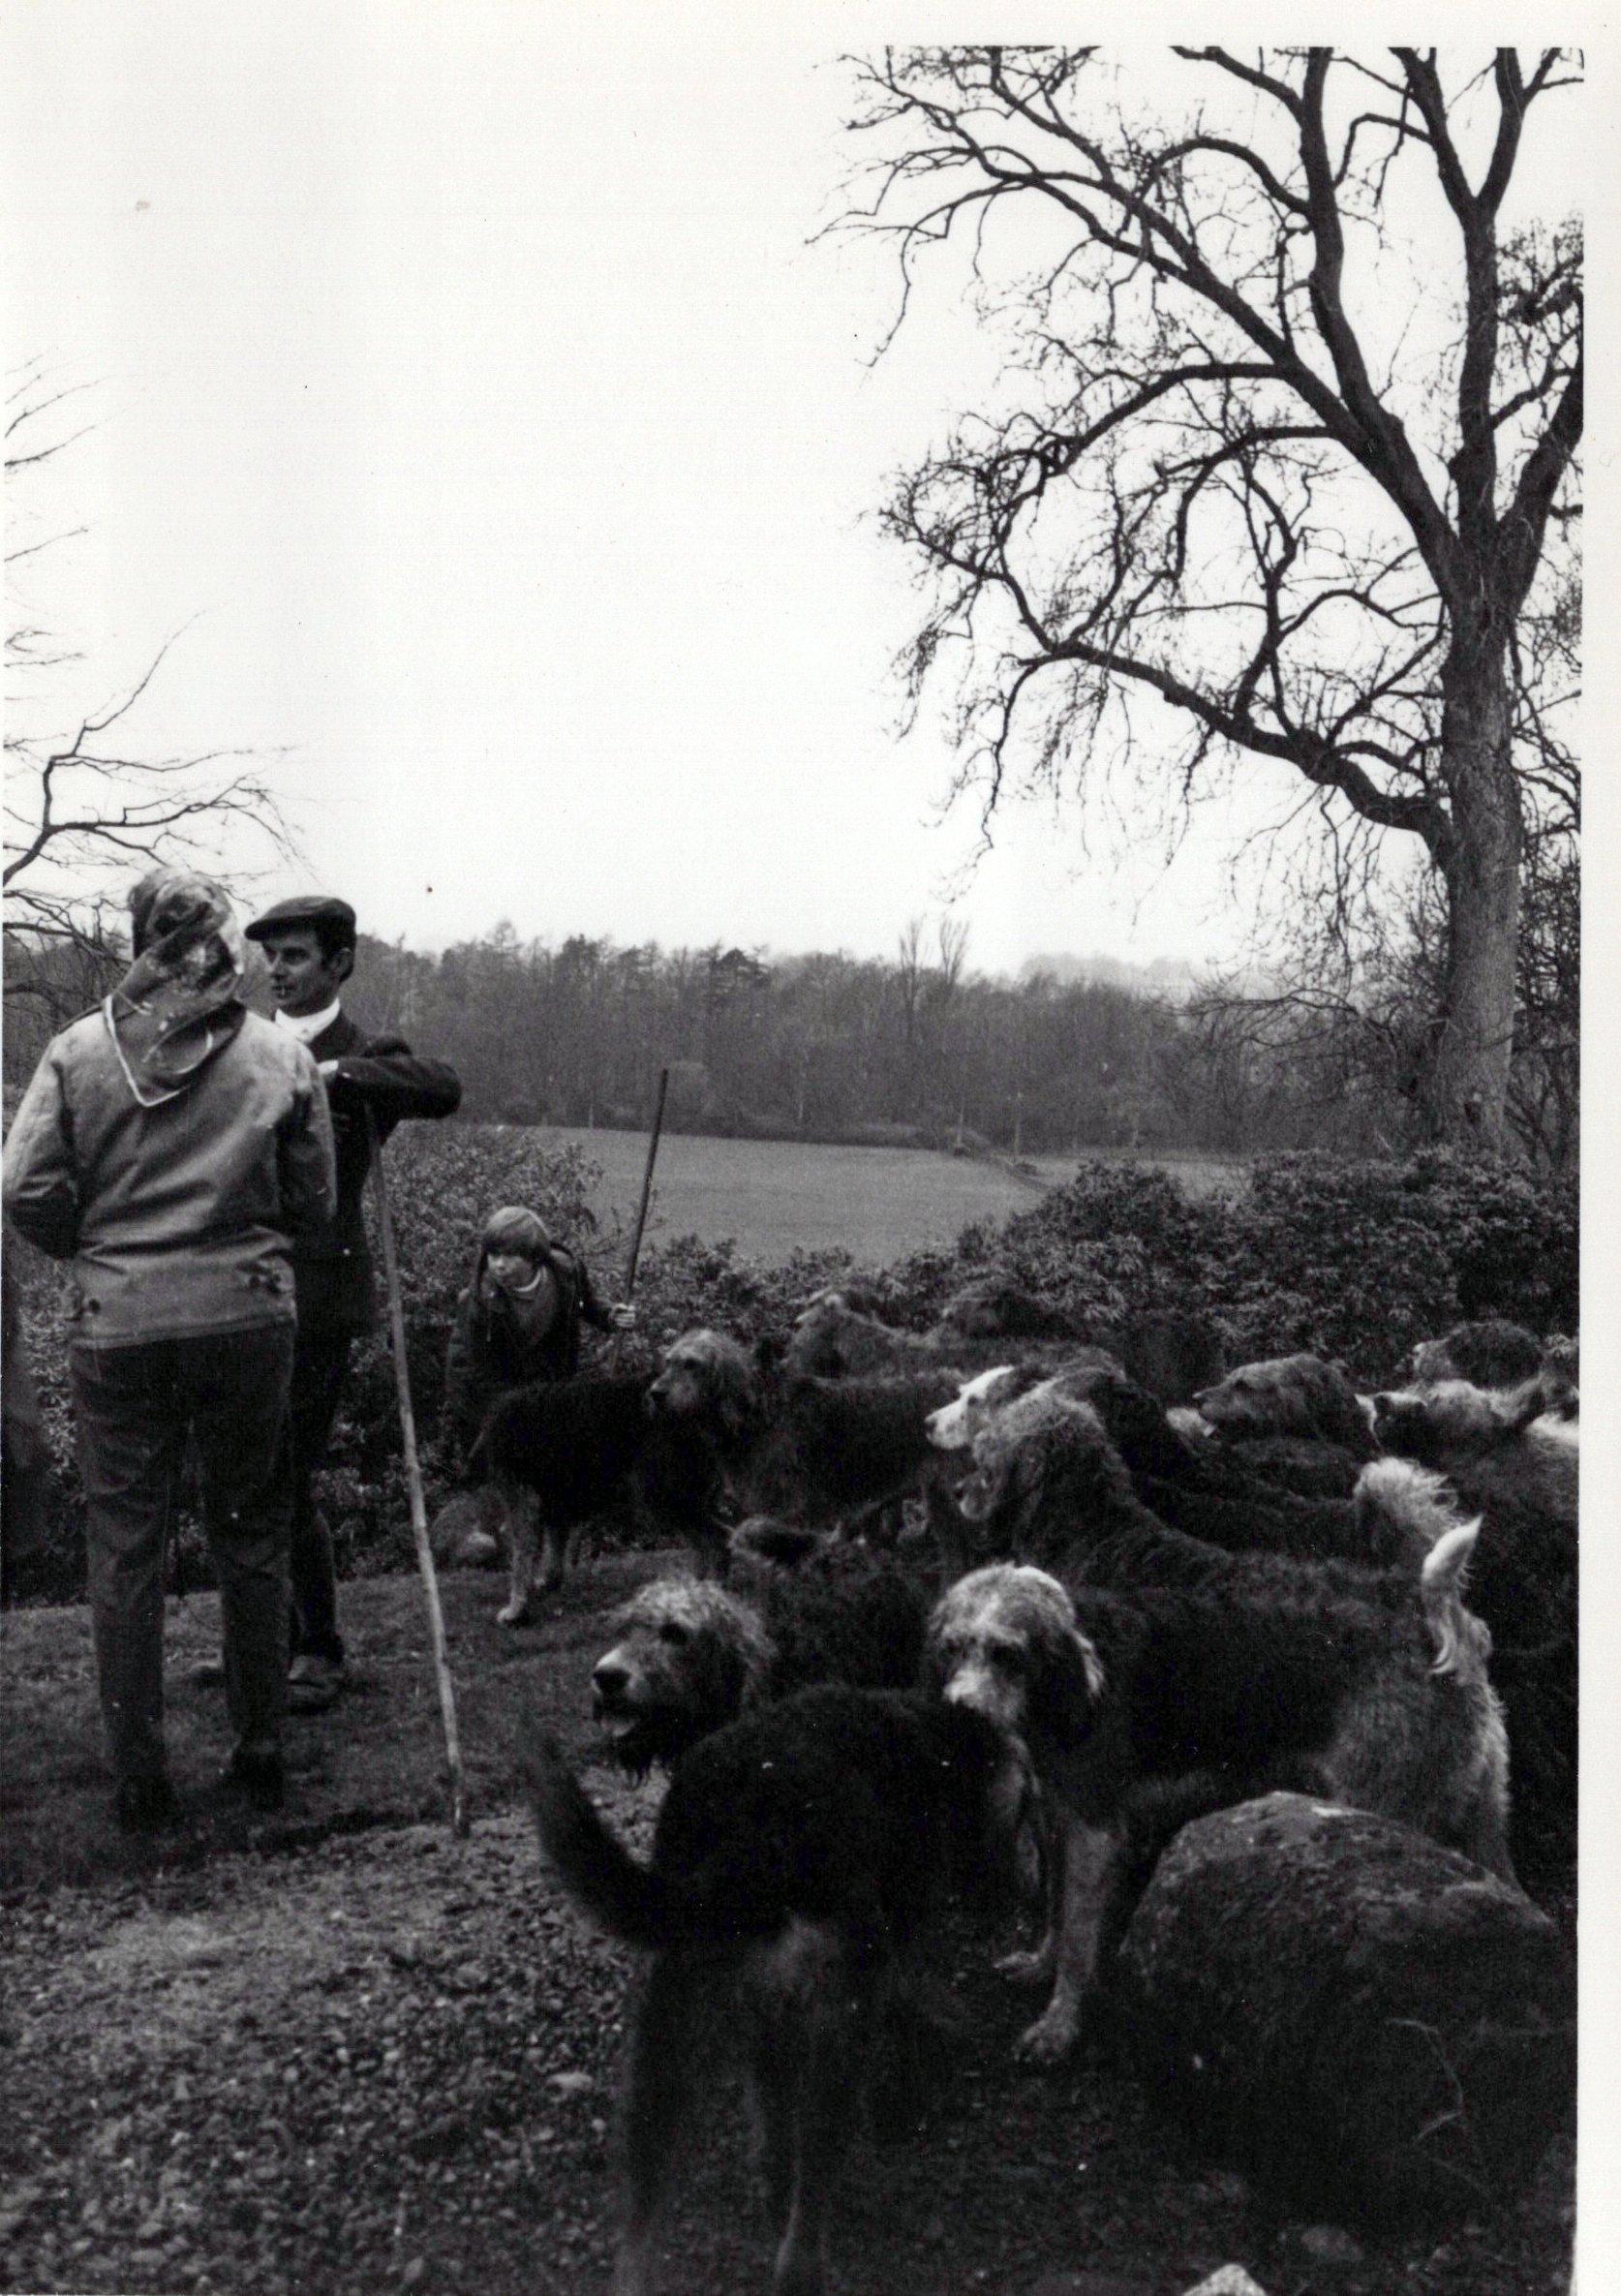 1970_Mei_Otterhound-Schotland_0007_a